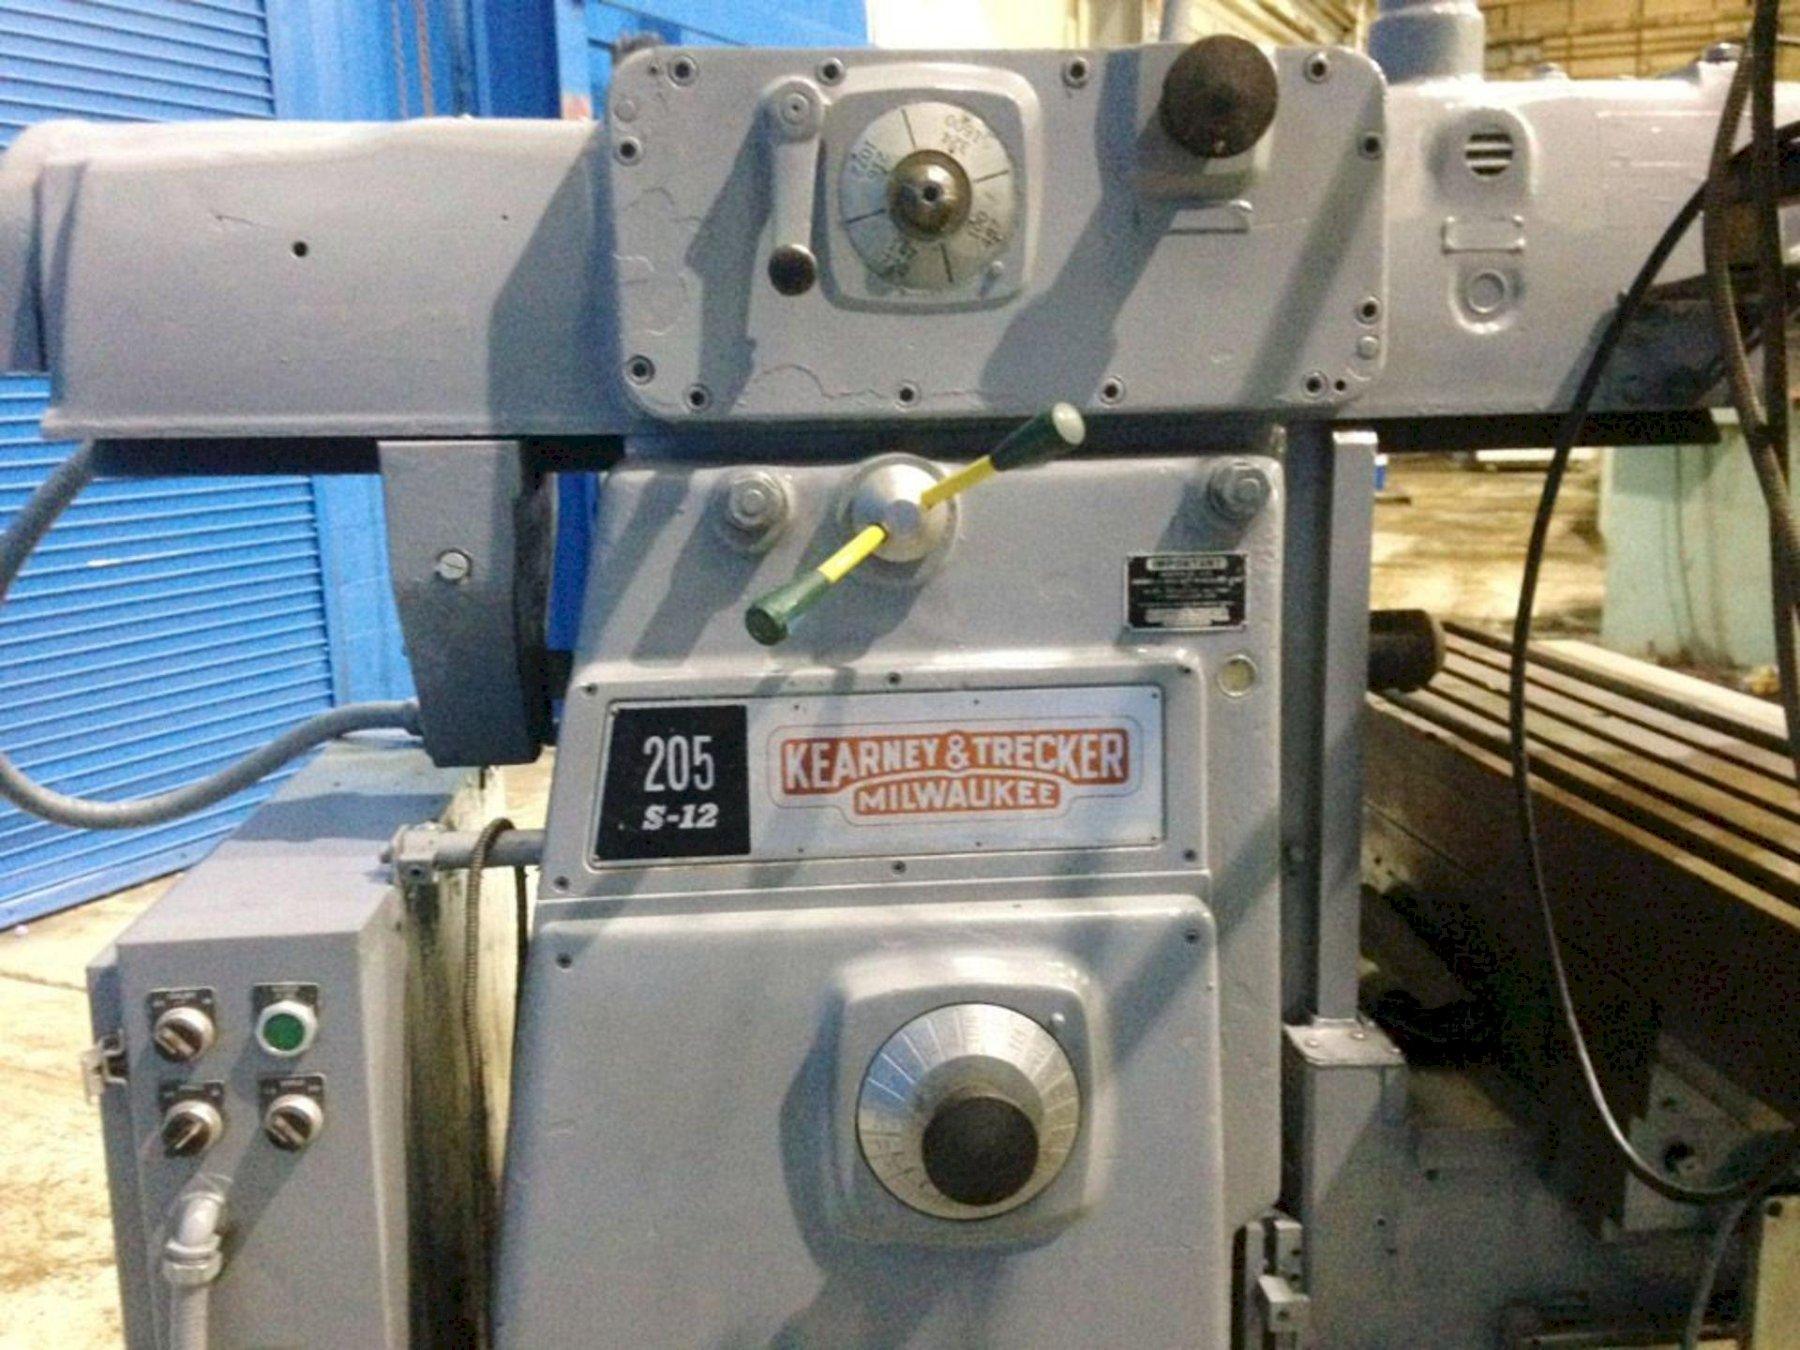 "12"" X 56"" KEARNEY & TRECKER MODEL 205 S-12 HORIZONTAL/VERTICAL MILLING MACHINE. STOCK # 0738021"